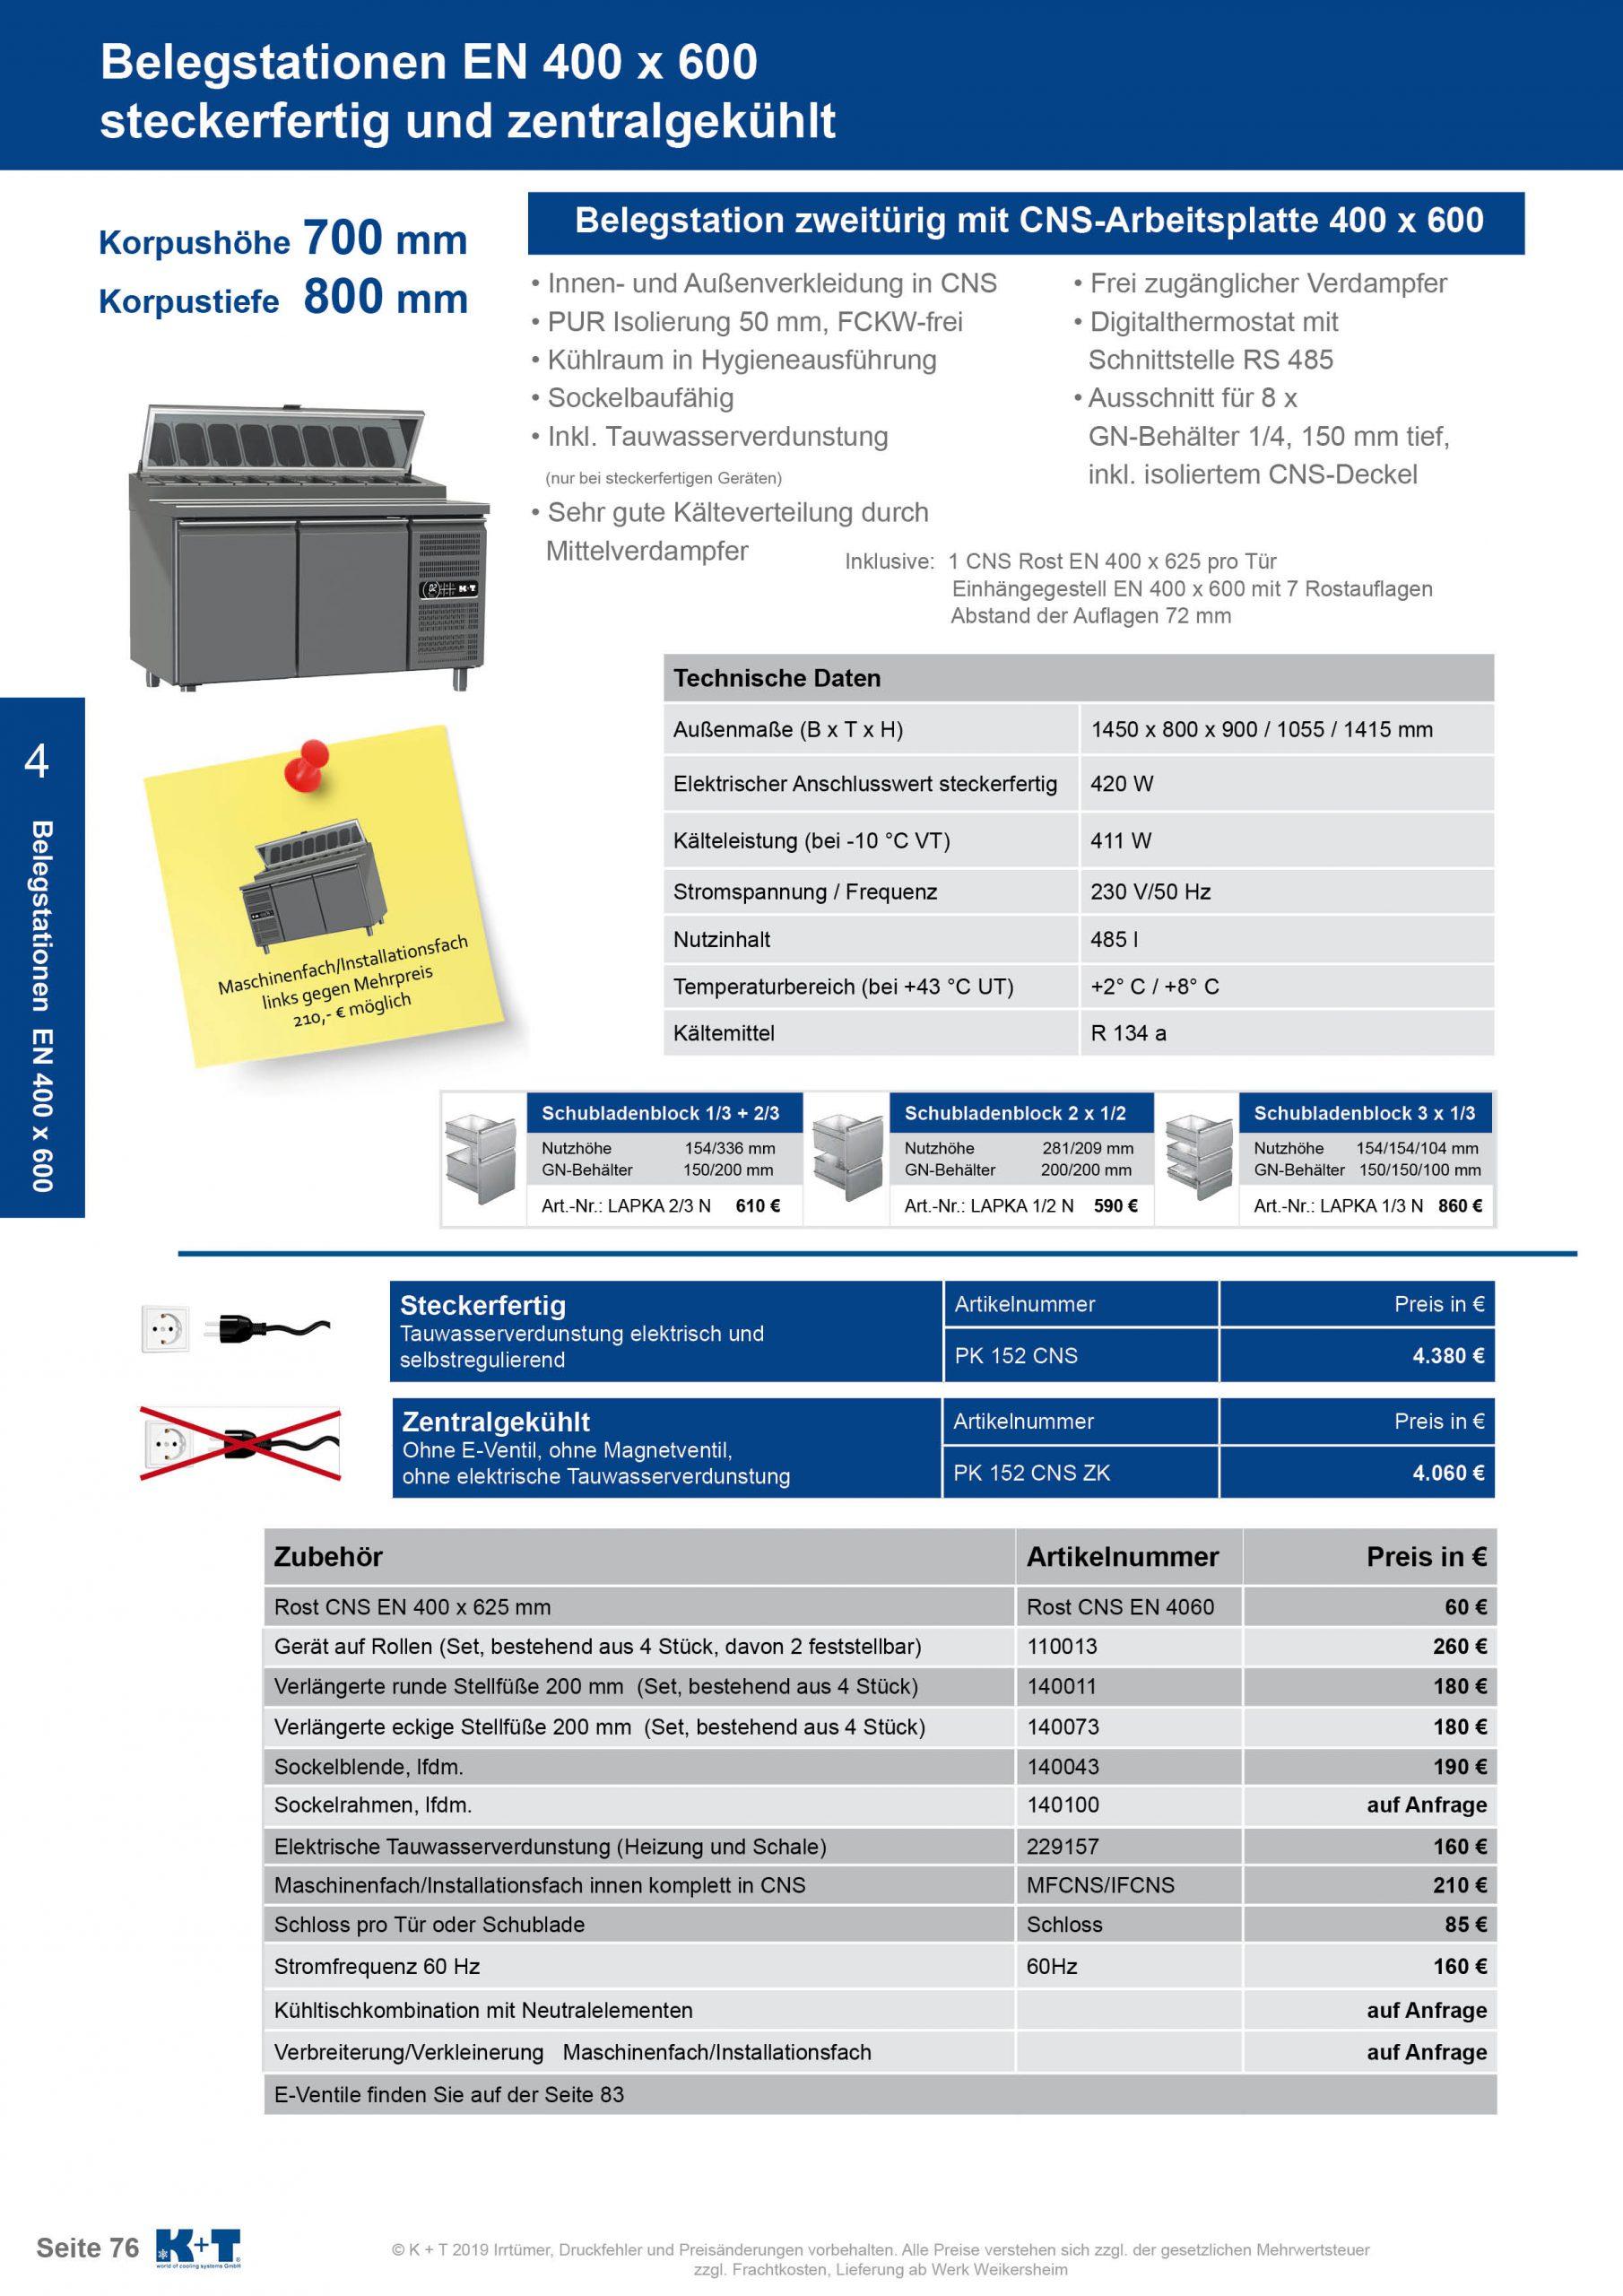 Belegstation Euronorm 400 x 600 Korpushöhe 700, Tiefe 800 zentralgekühlt 1